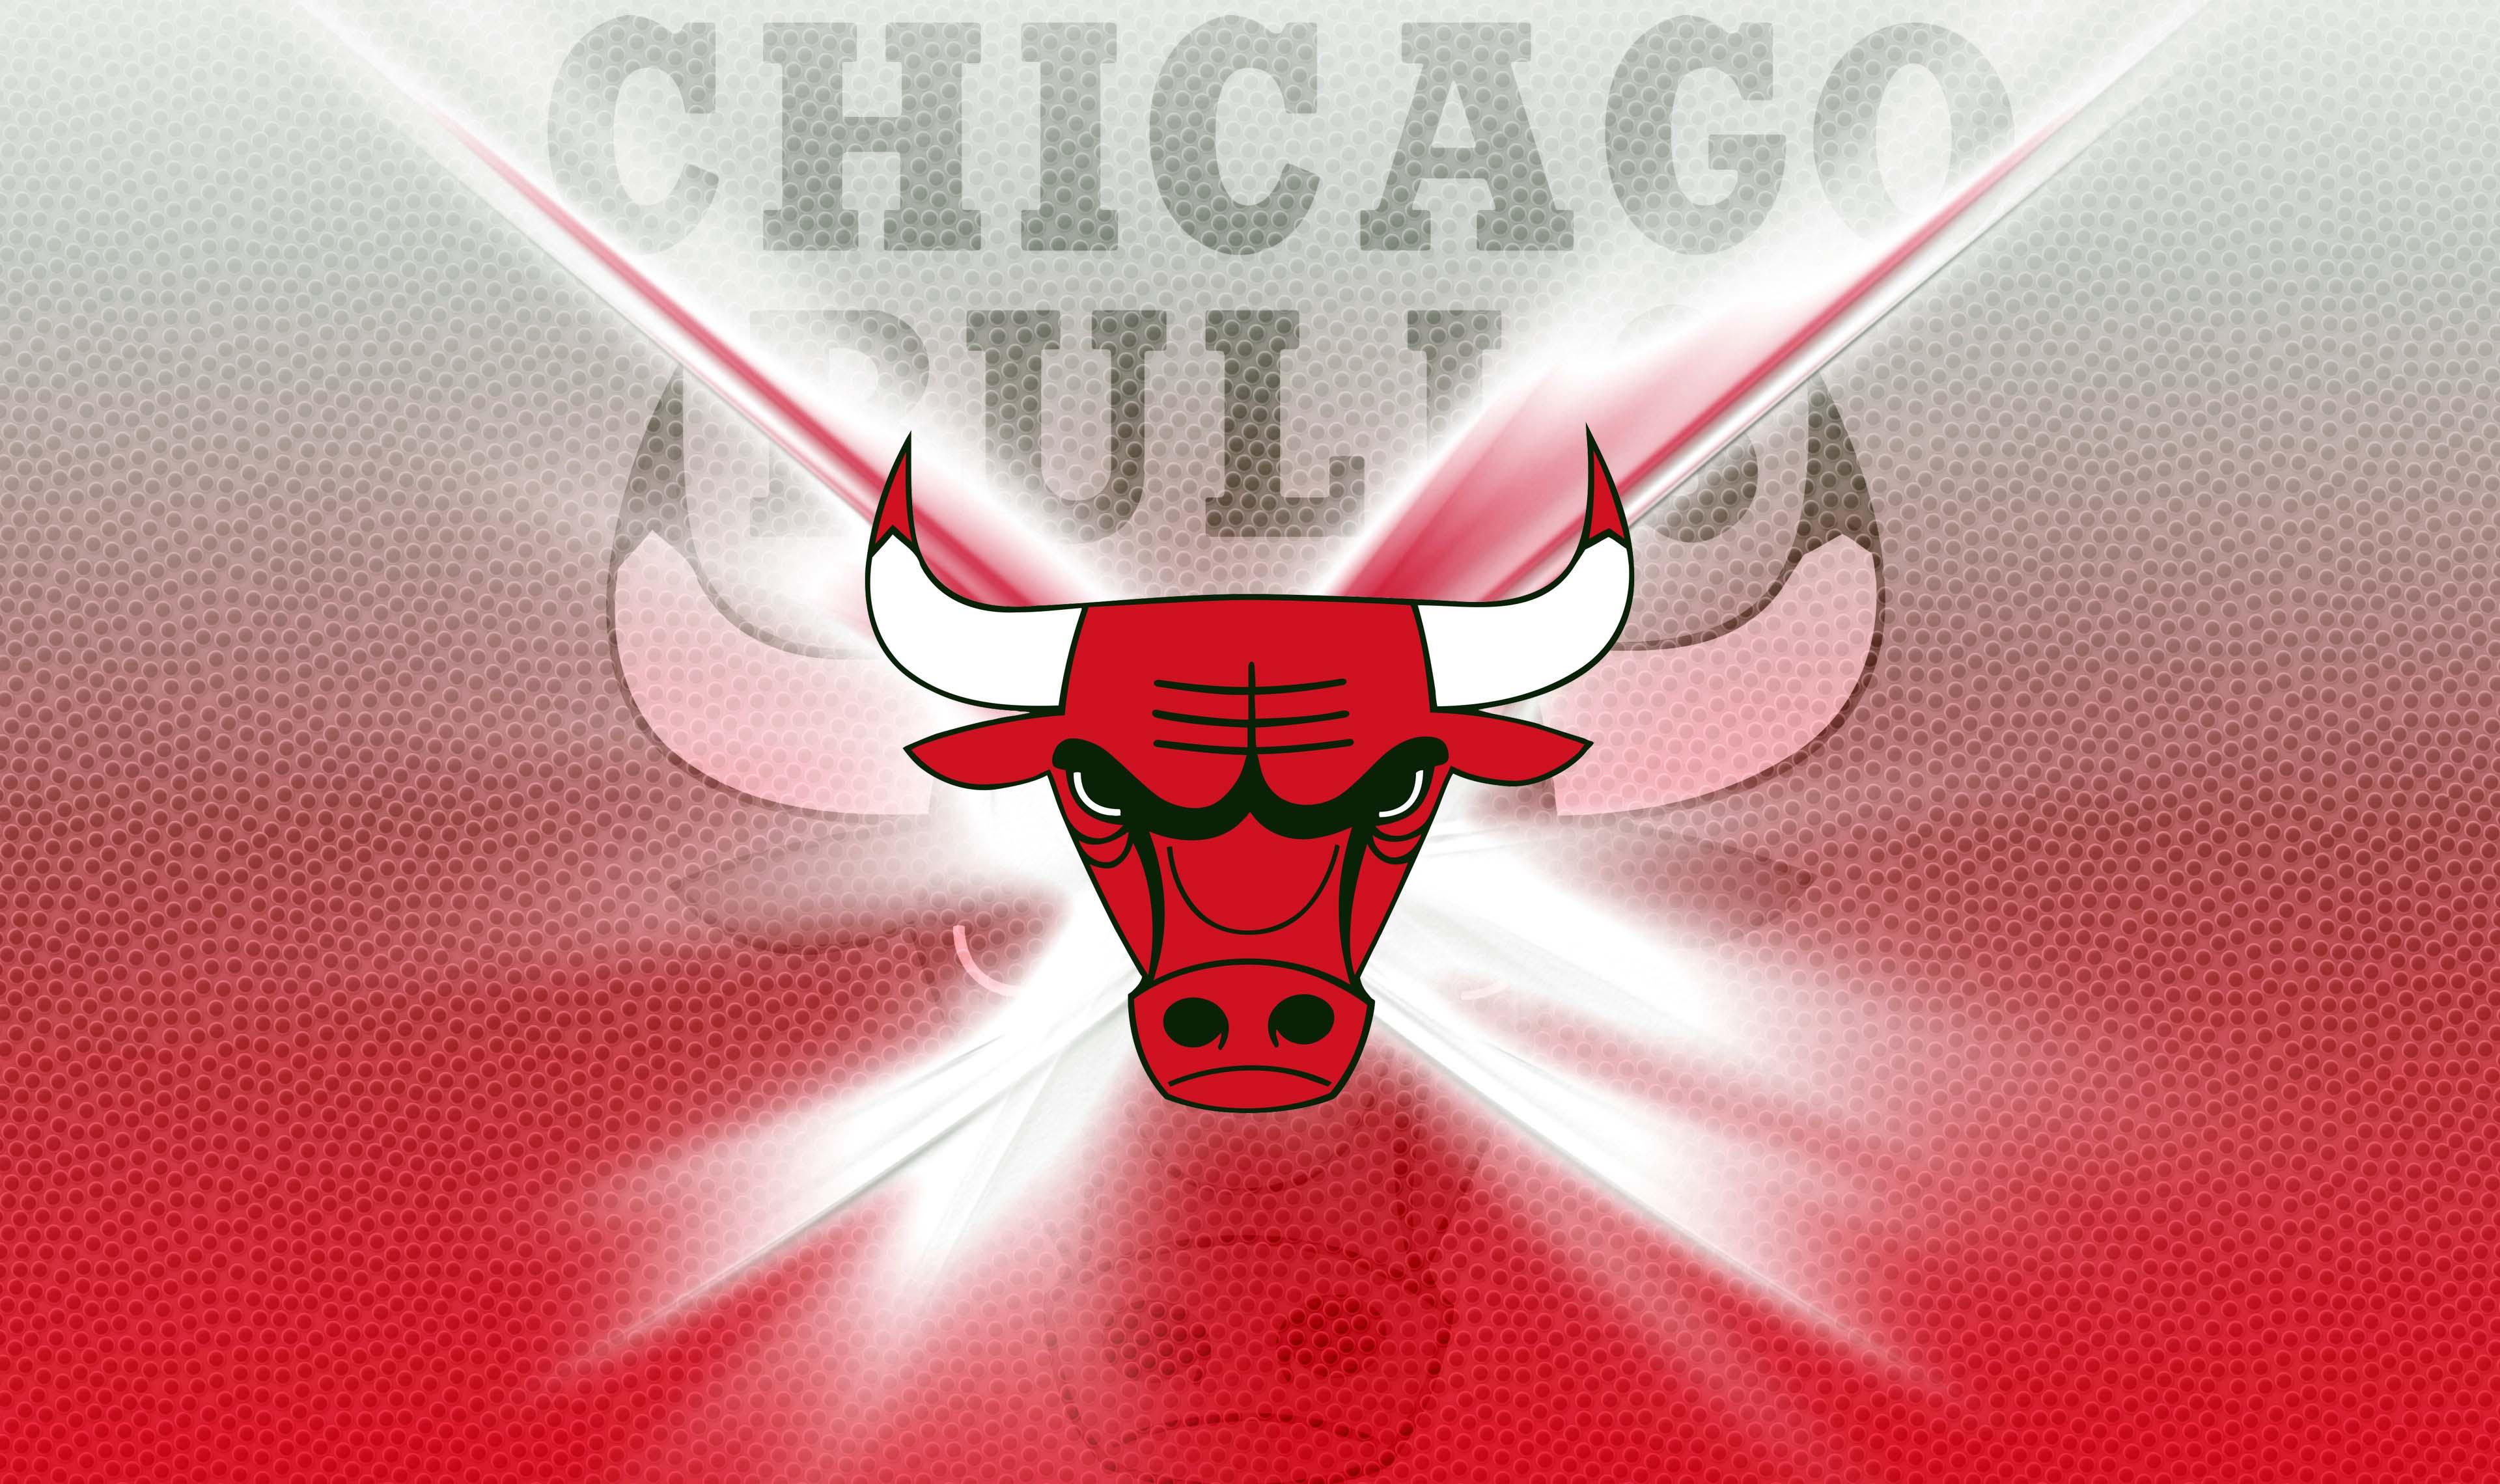 Top 11 Chicago Bulls HD Images For Desktop